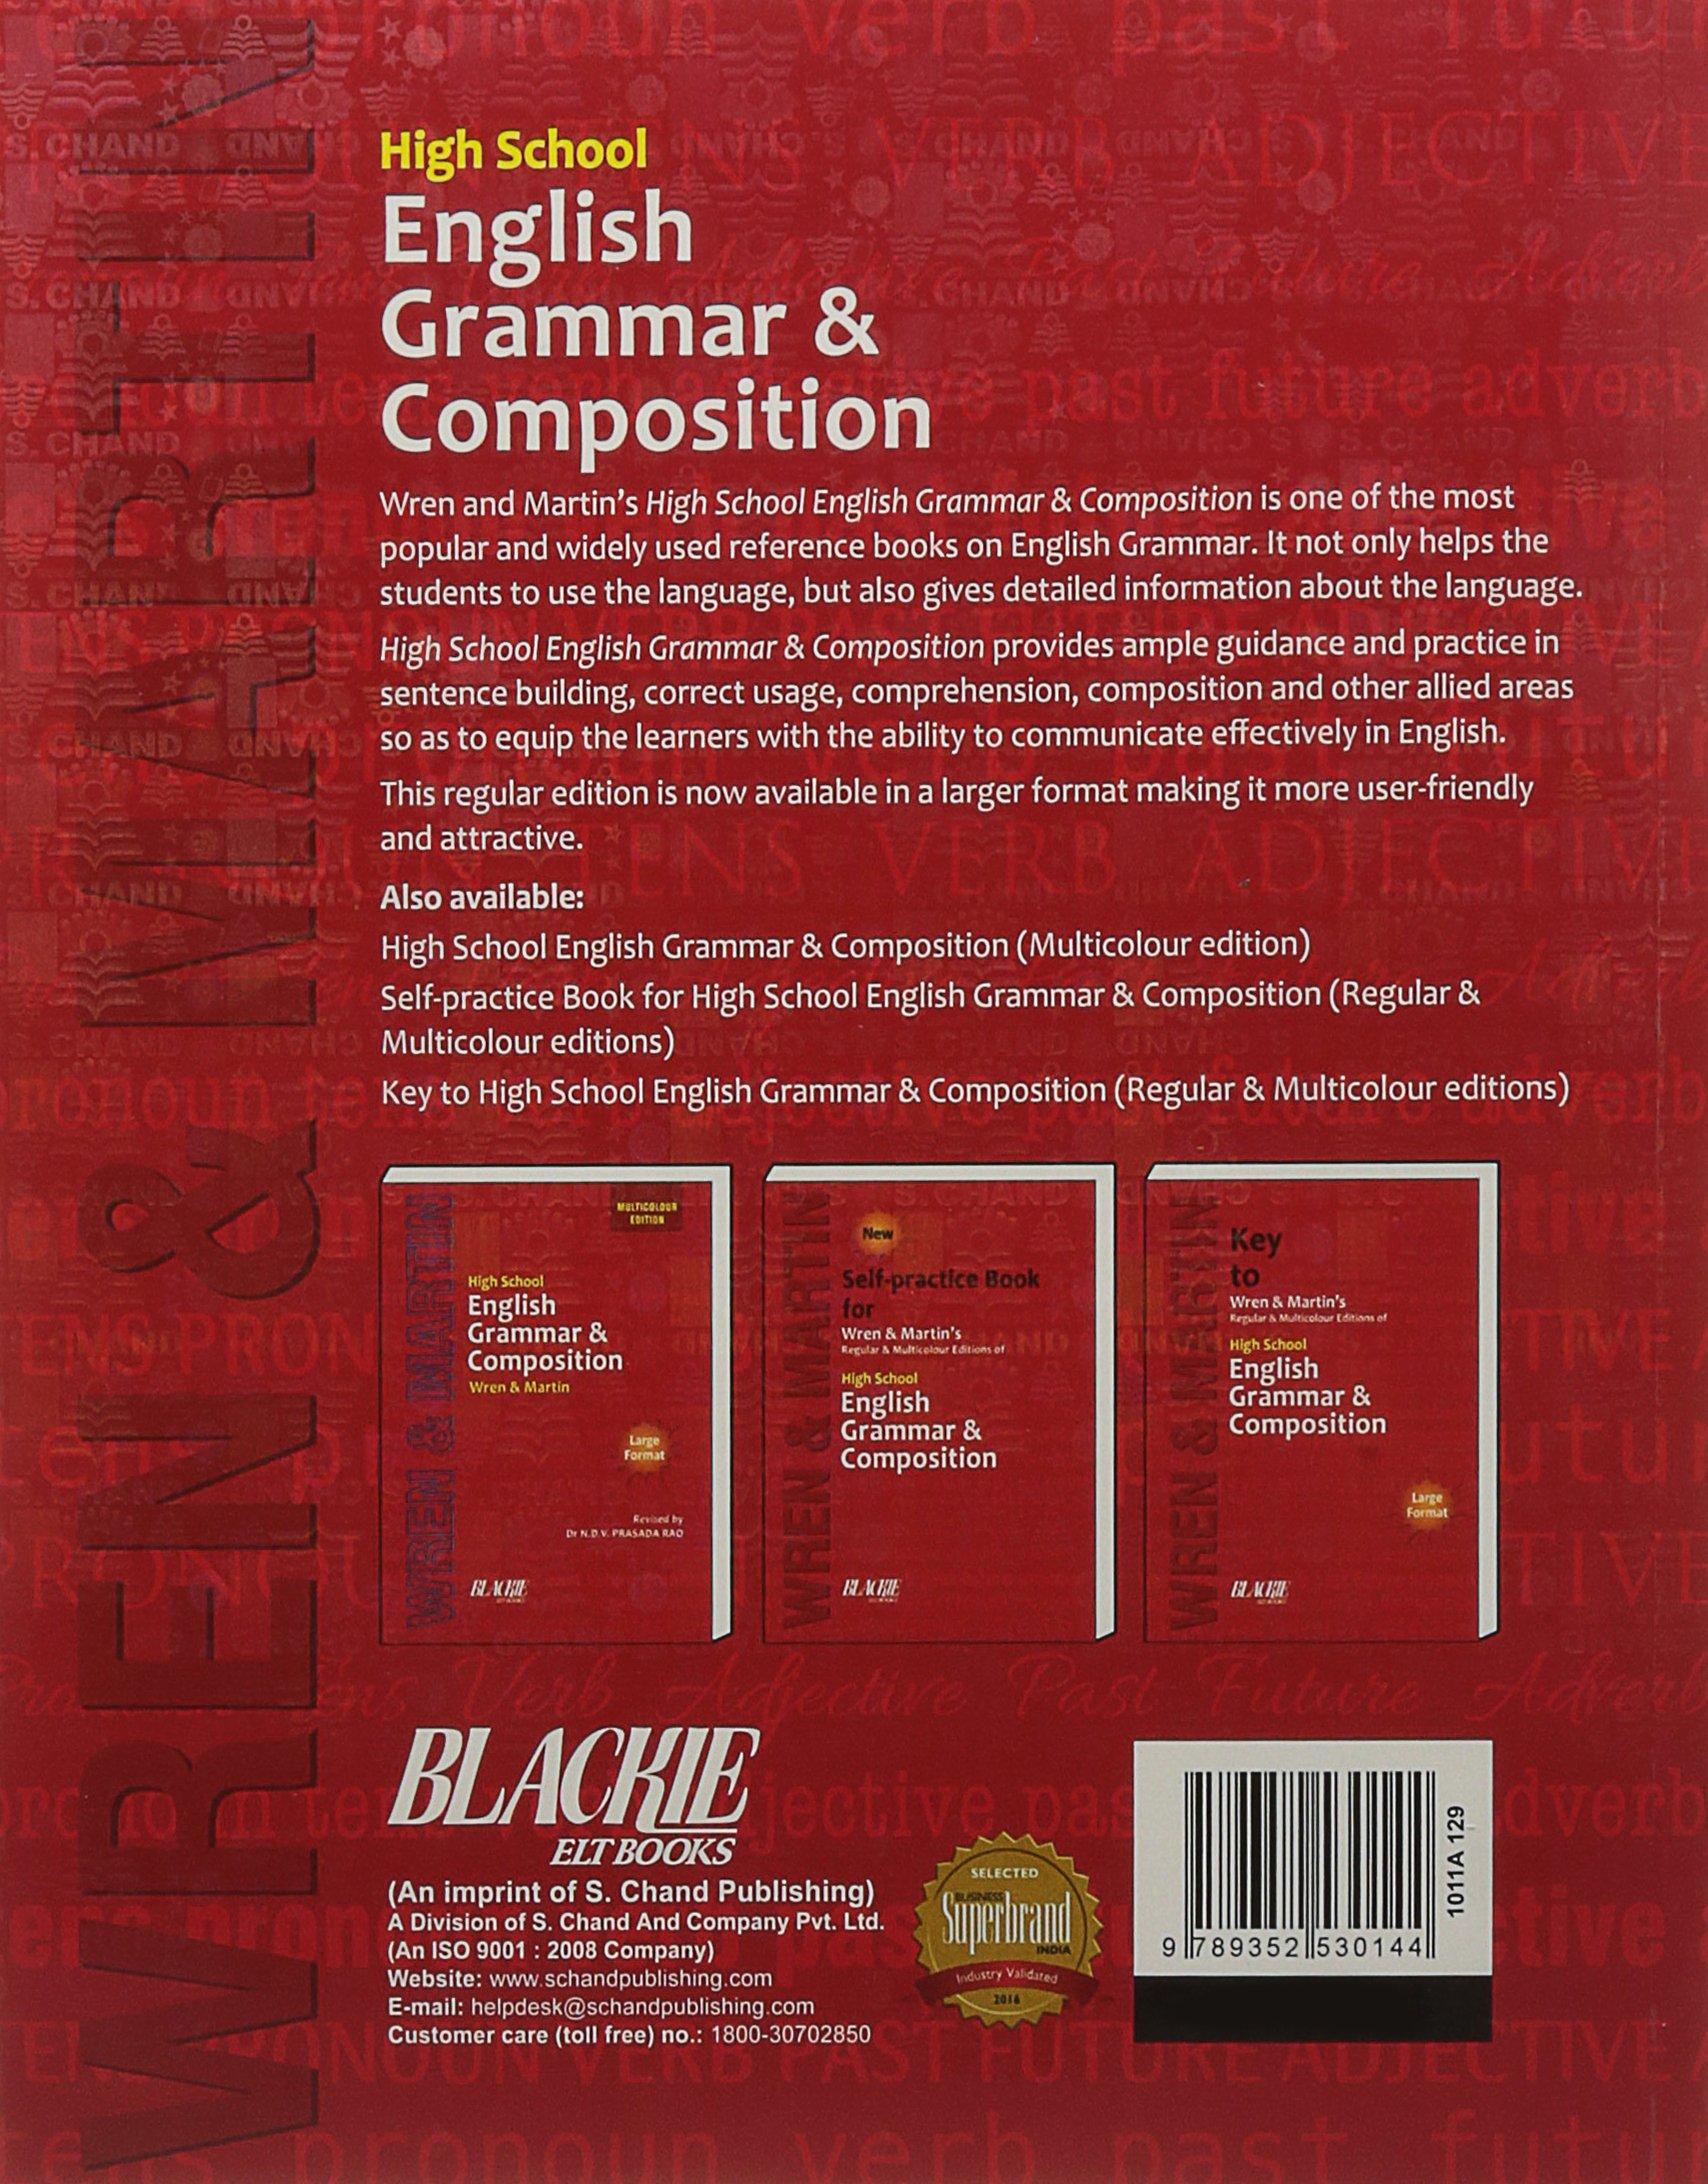 High School English Grammar and Composition Book (Regular Edition) (9352530144) Amazon Price History, Amazon Price Tracker